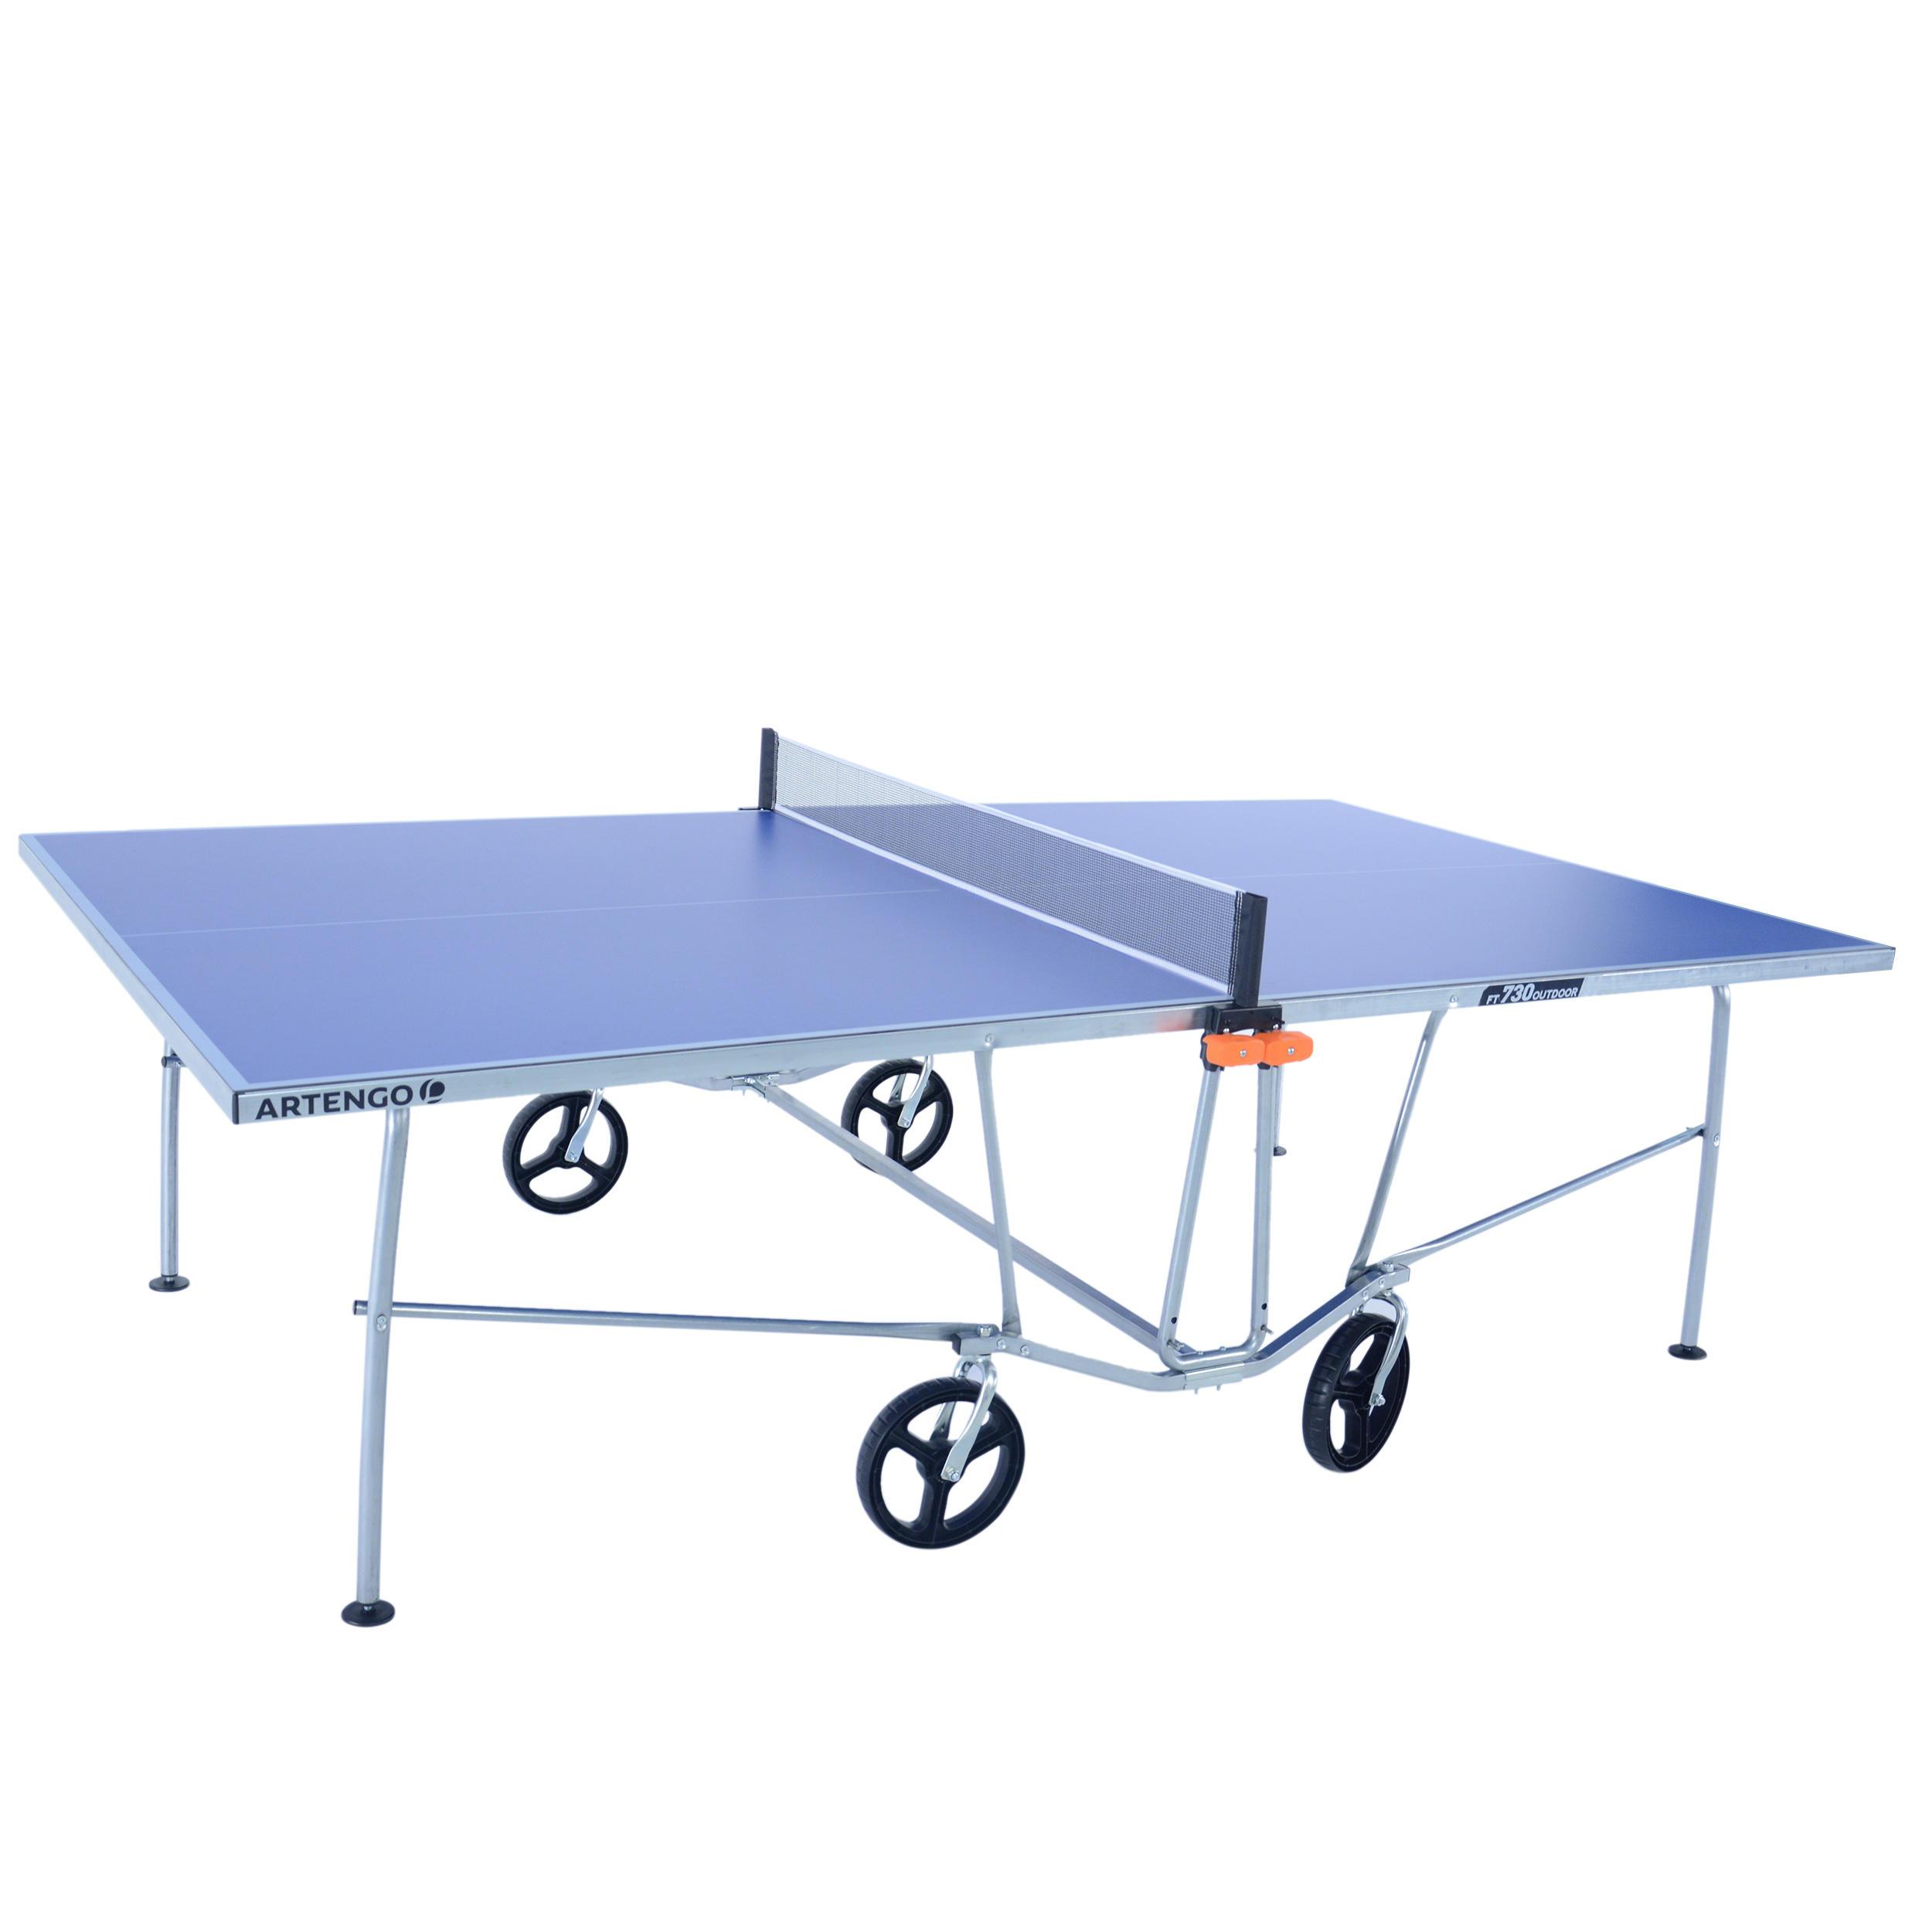 Artengo Tafeltennistafel outdoor PPT 500